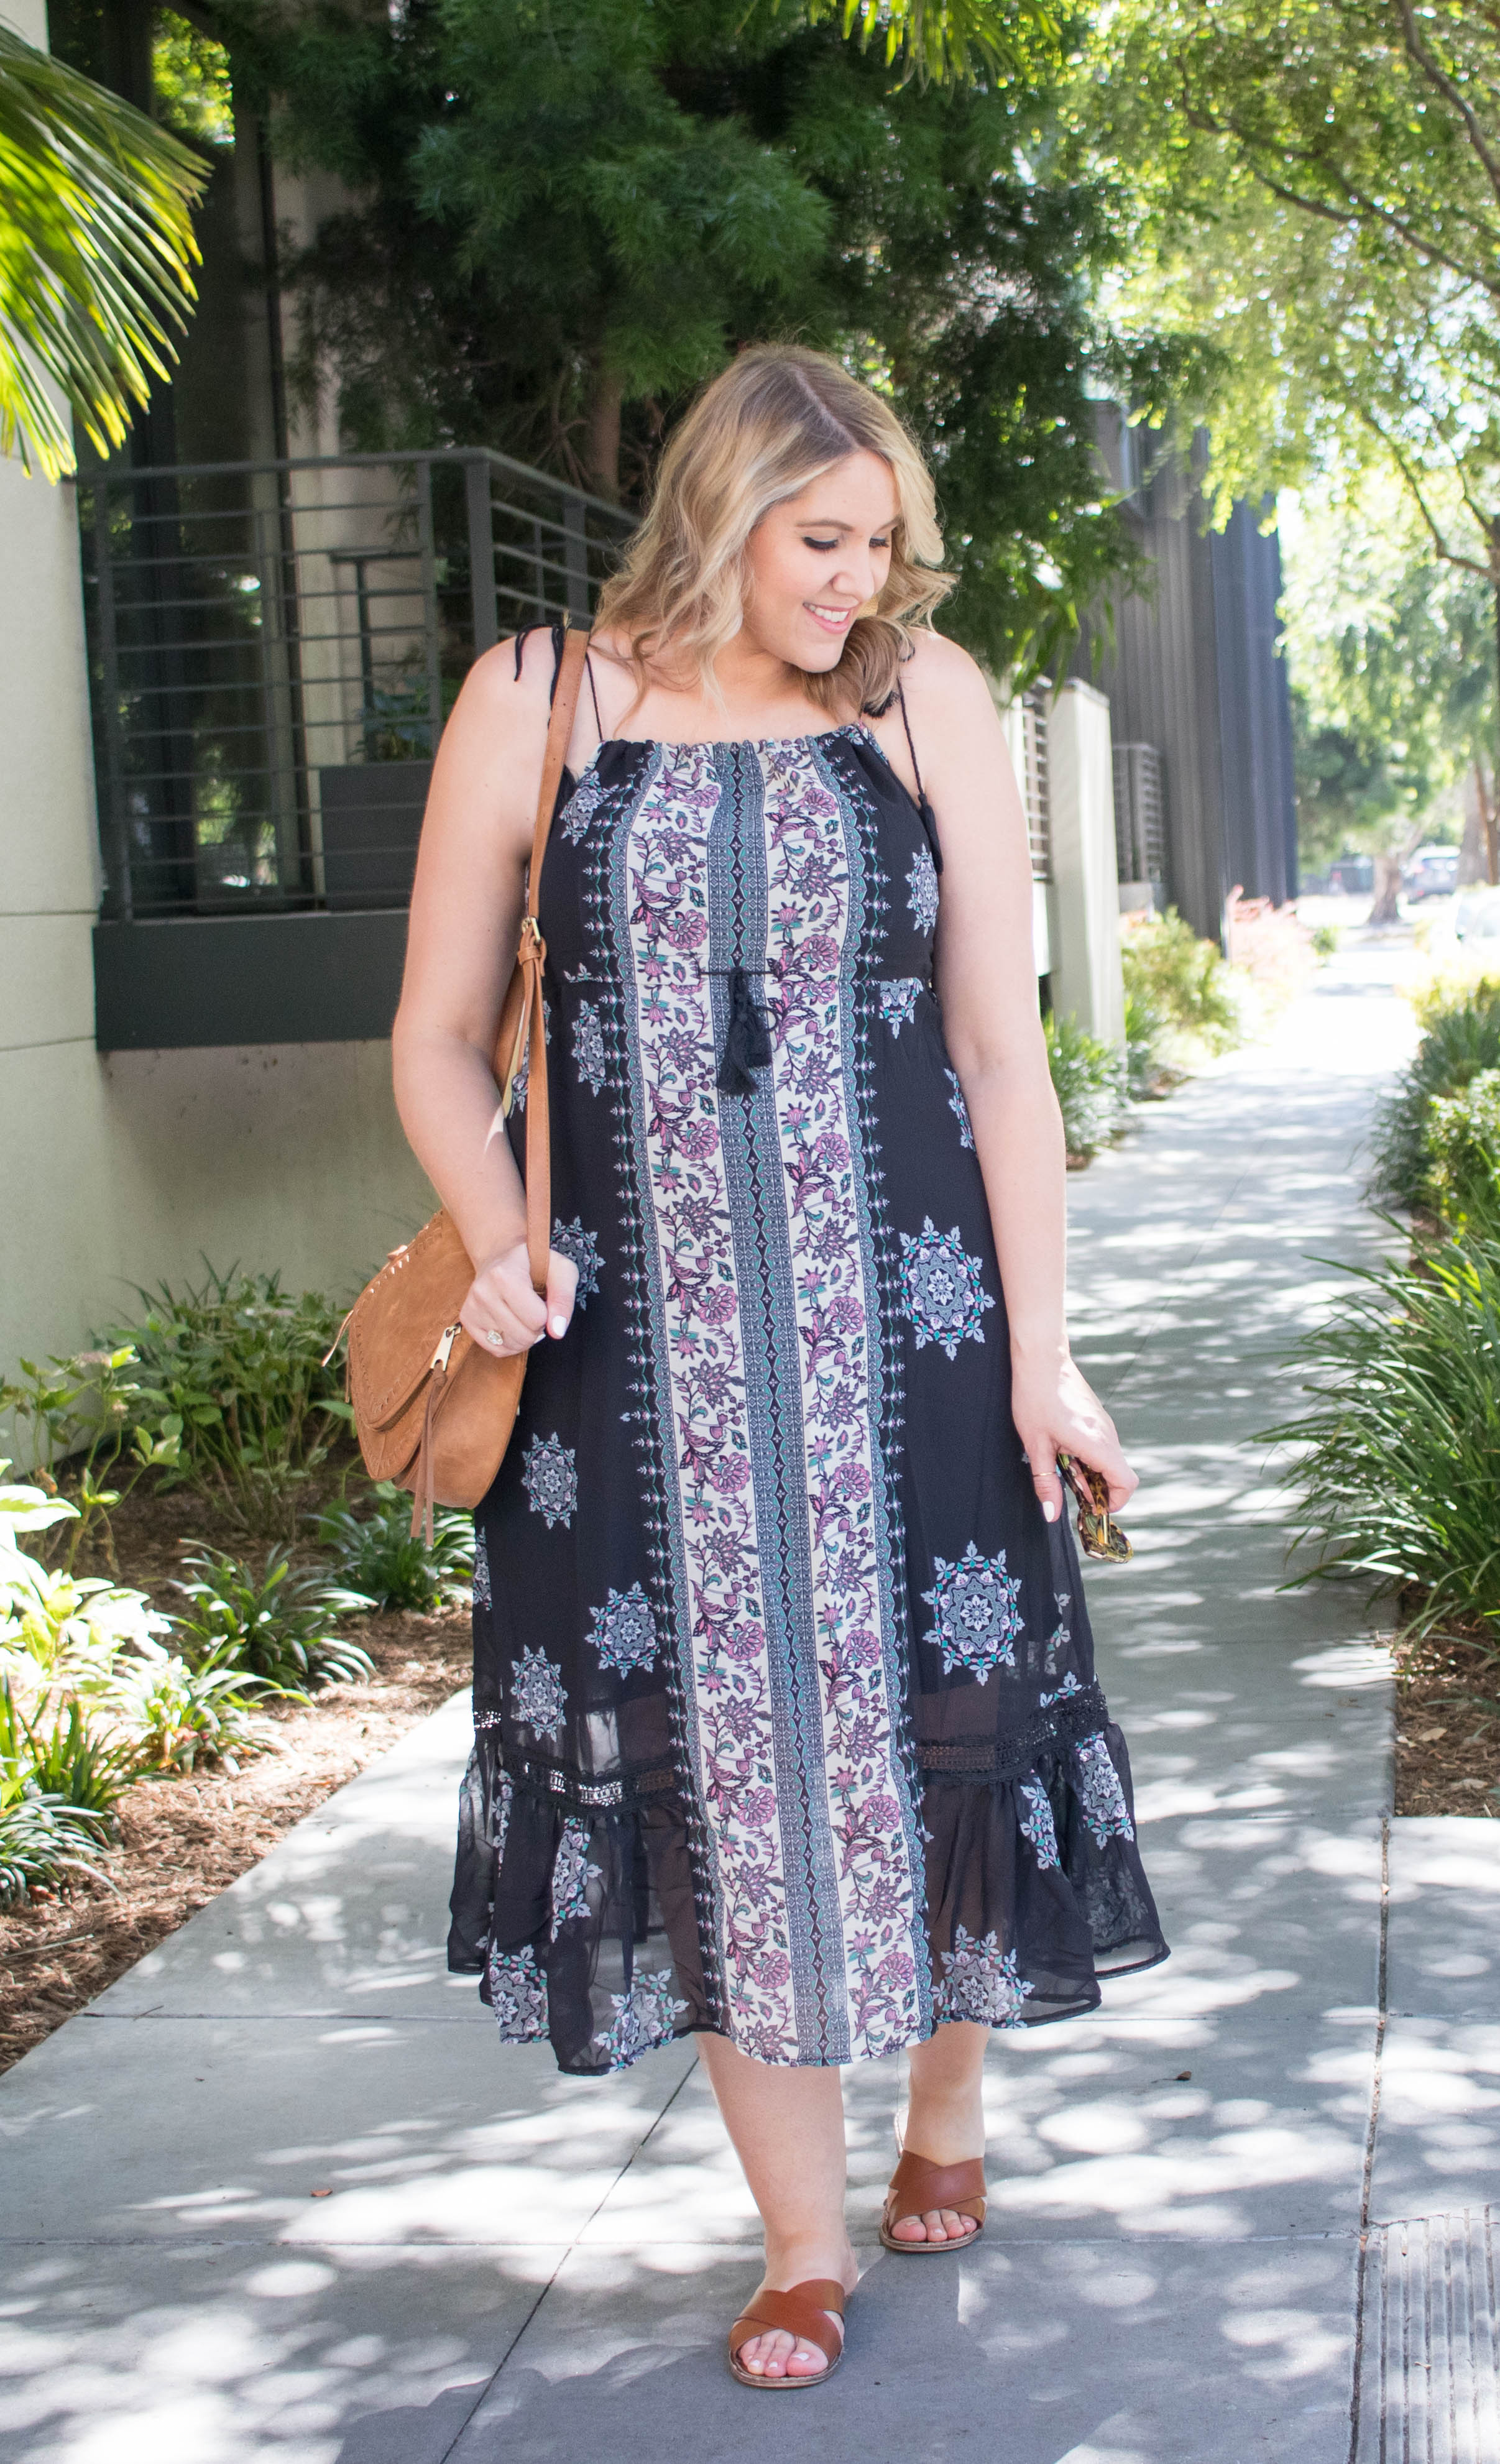 Bella Ella boutique maxi dress summer outfit #summerstyle #bohostyle #styleblogger